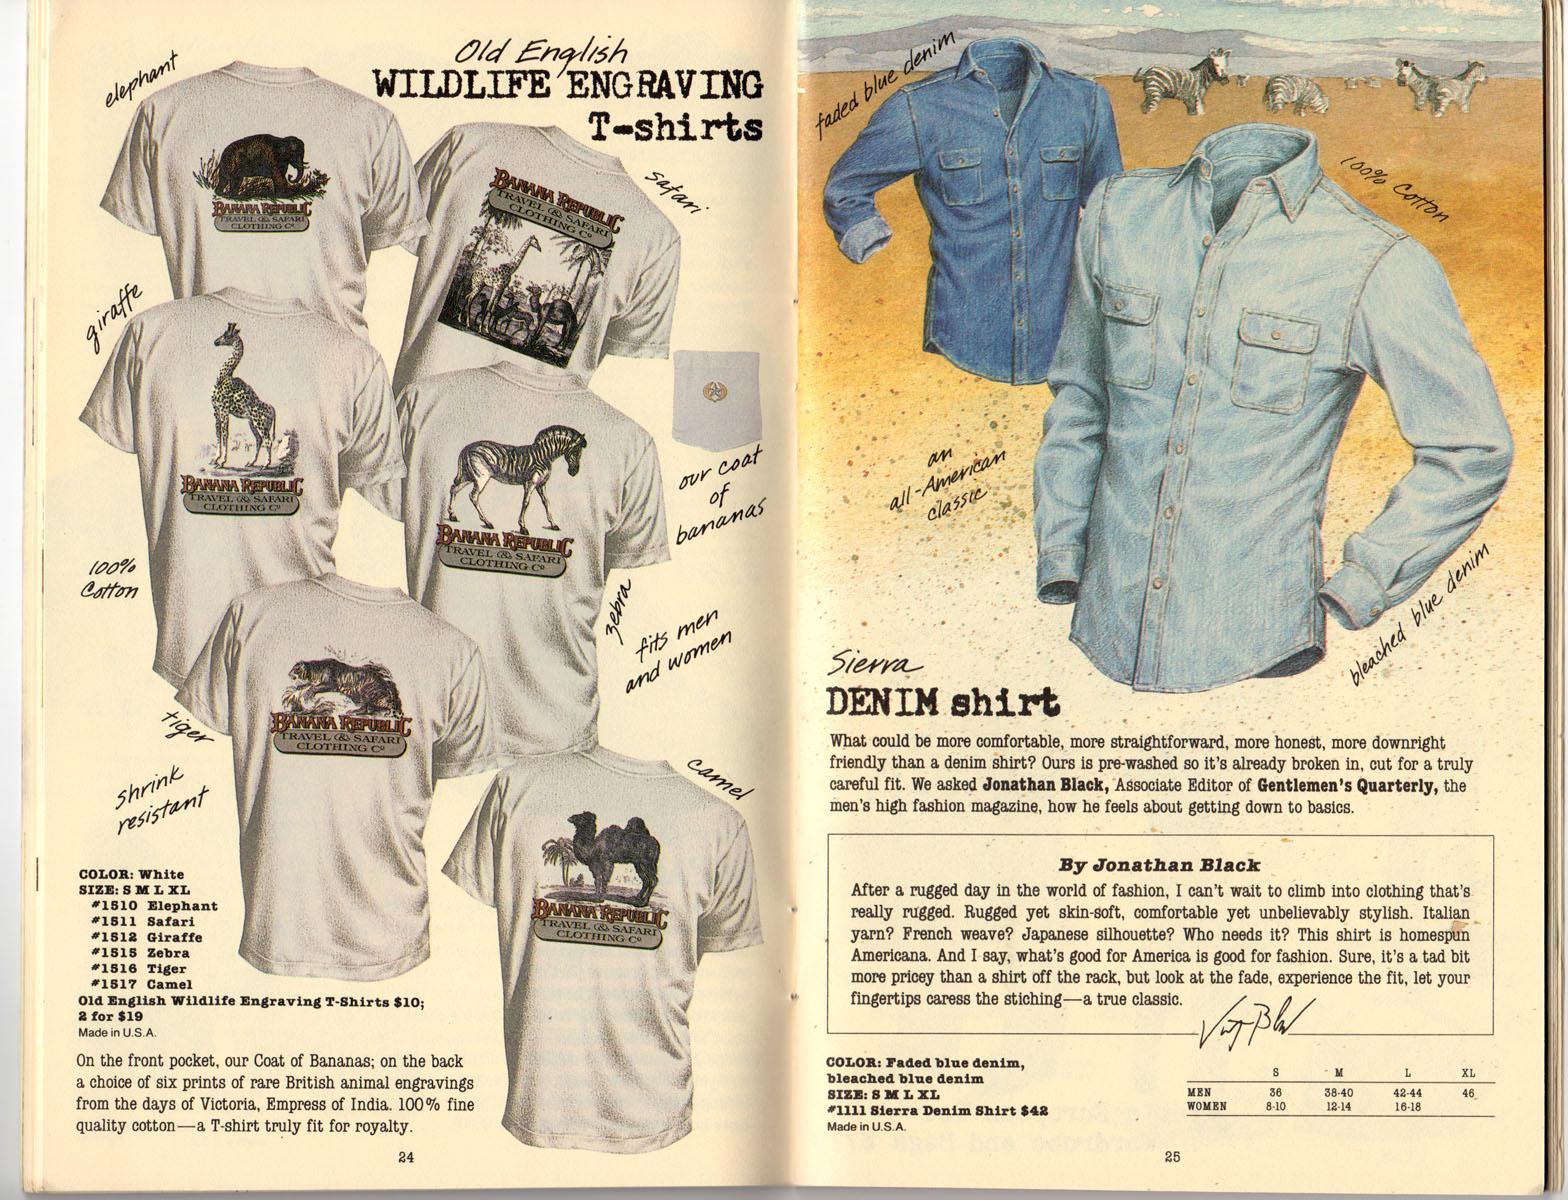 Banana Republic Summer 1985 Update #24 Old English Engraving T-Shirts, Denim Shirt